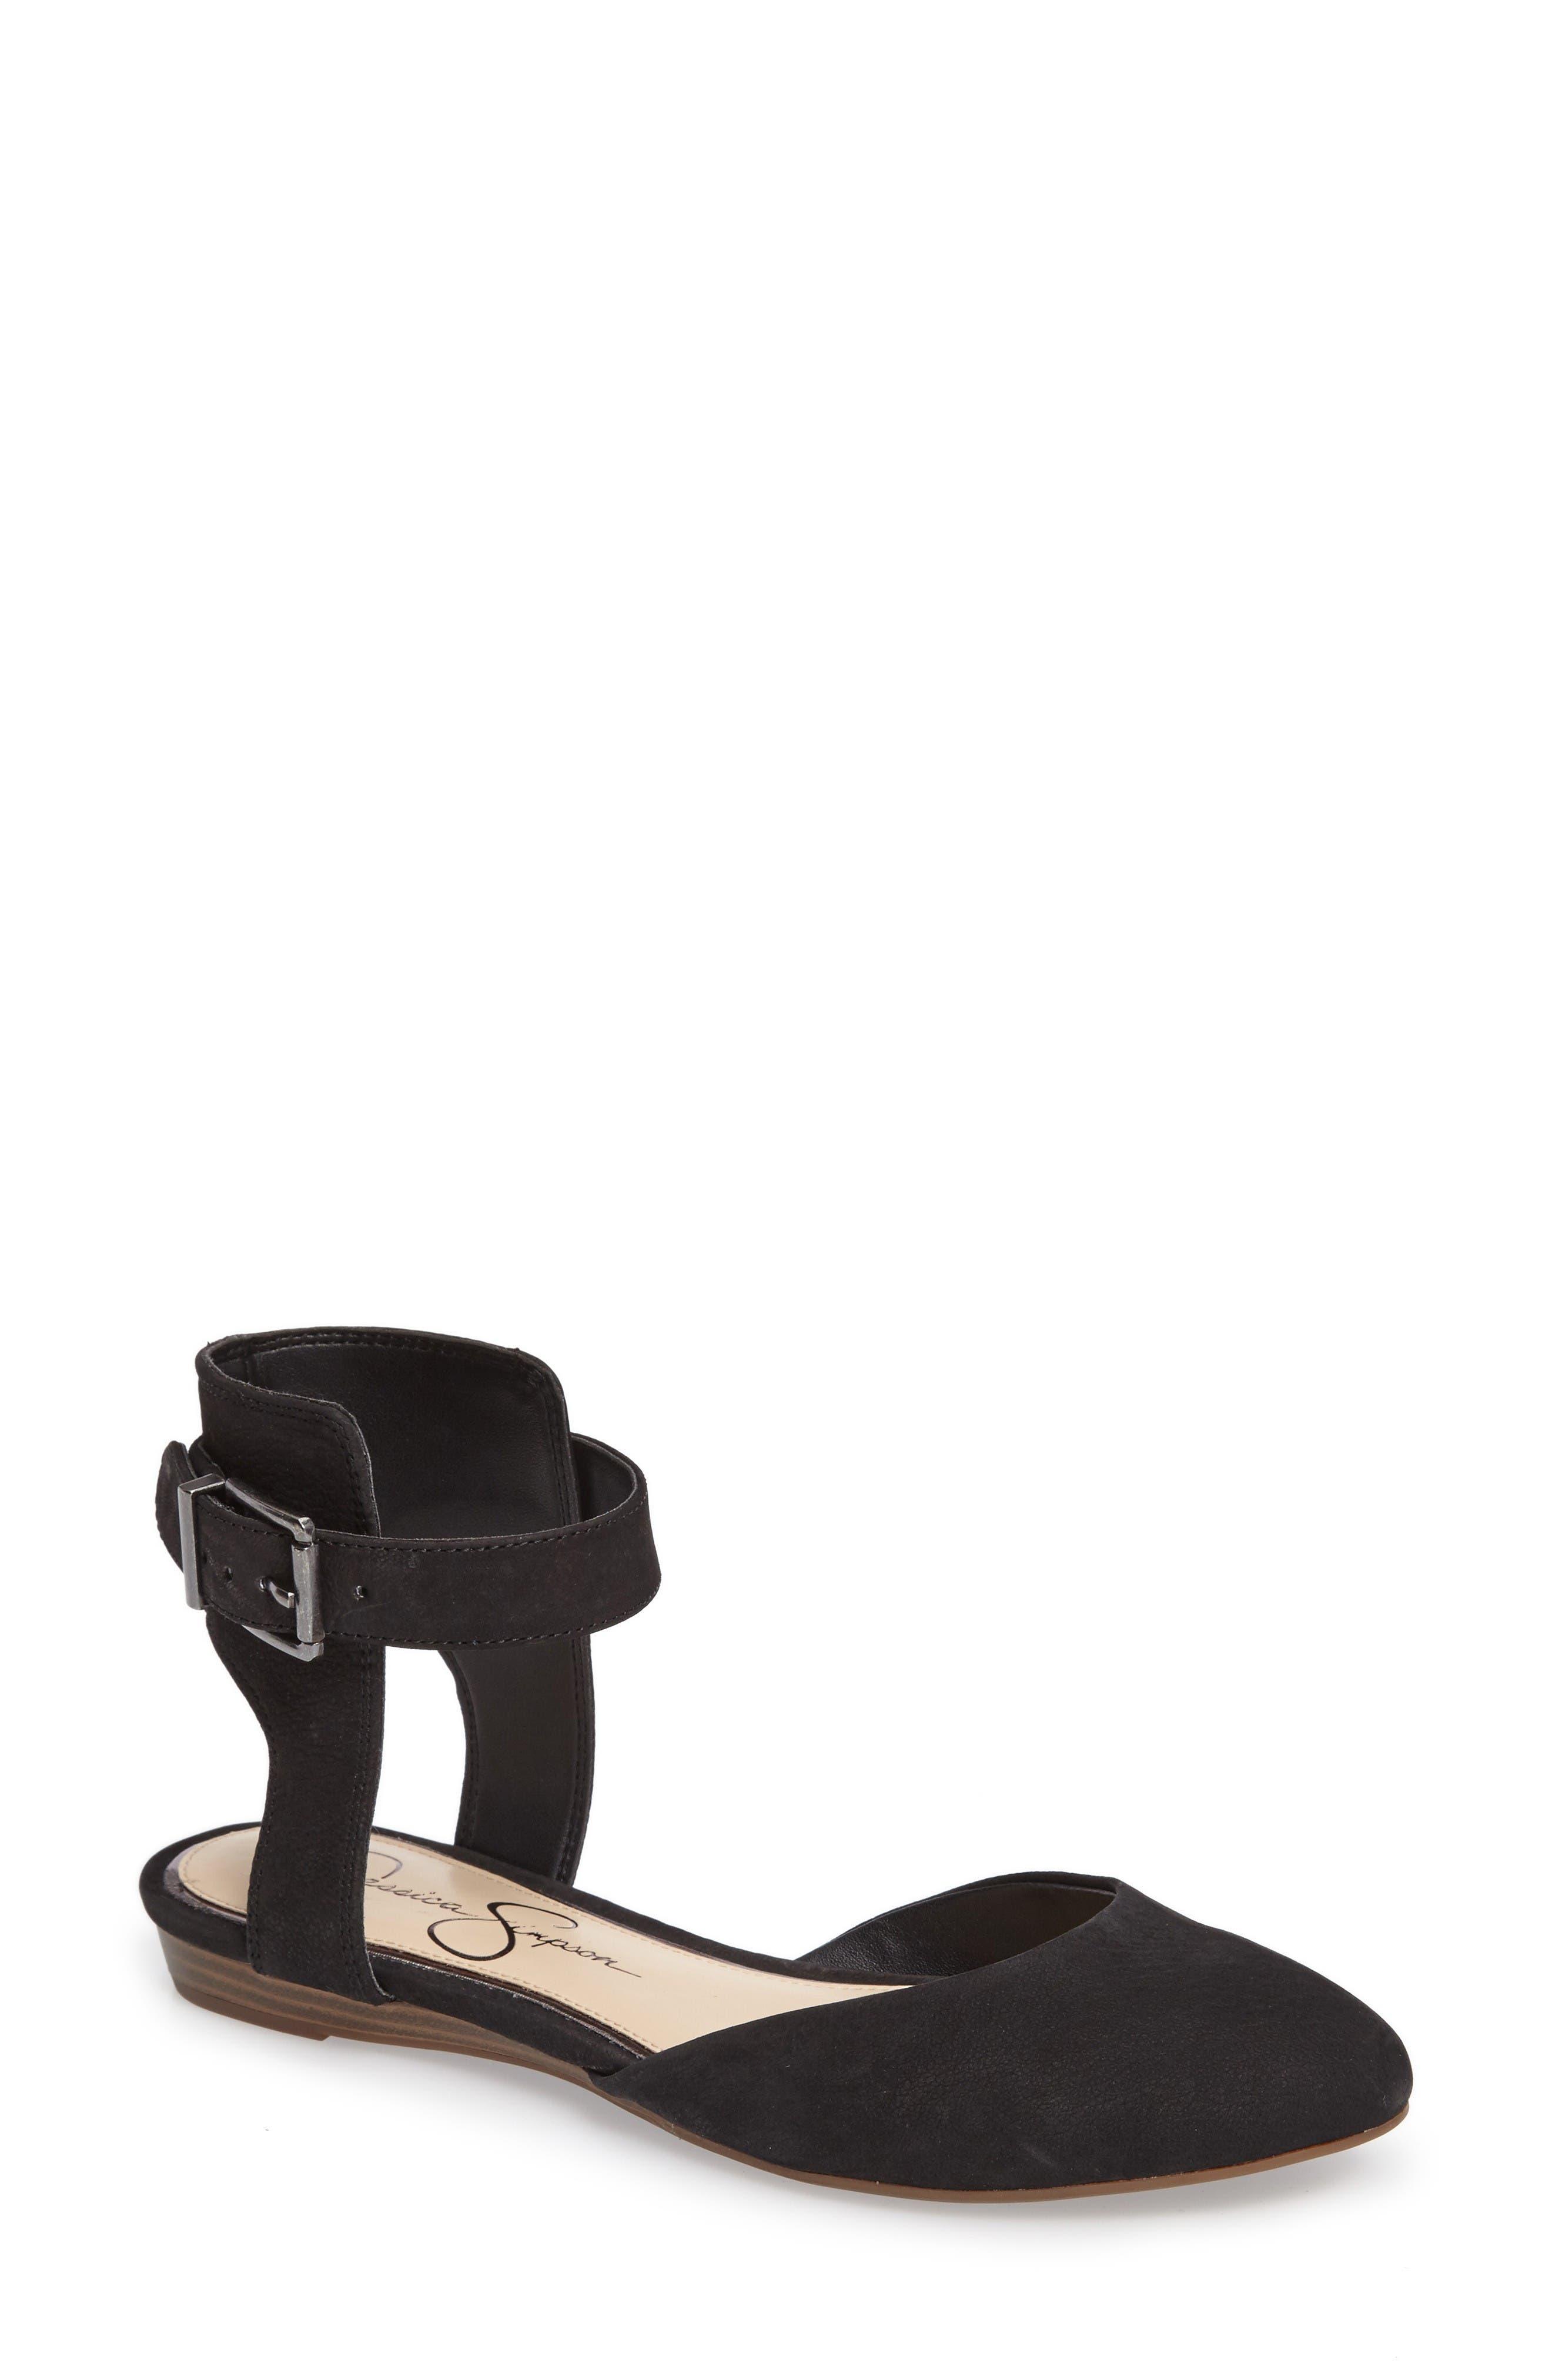 Main Image - Jessica Simpson Loranda Ankle Strap Flat (Women)